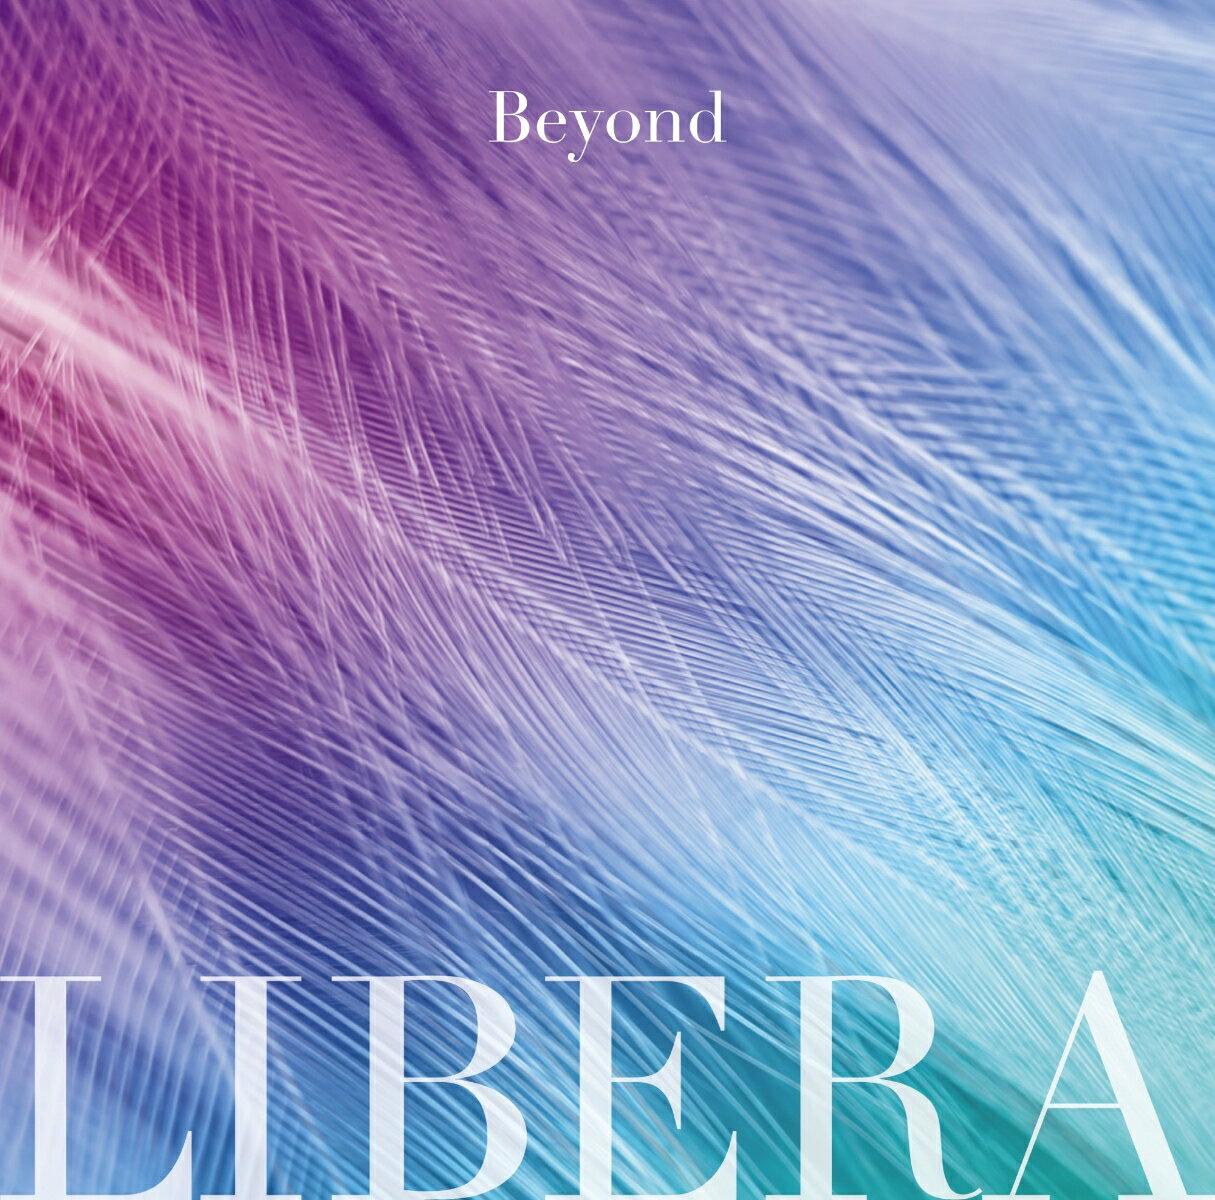 beyond (CD+DVD) [ リベラ ]